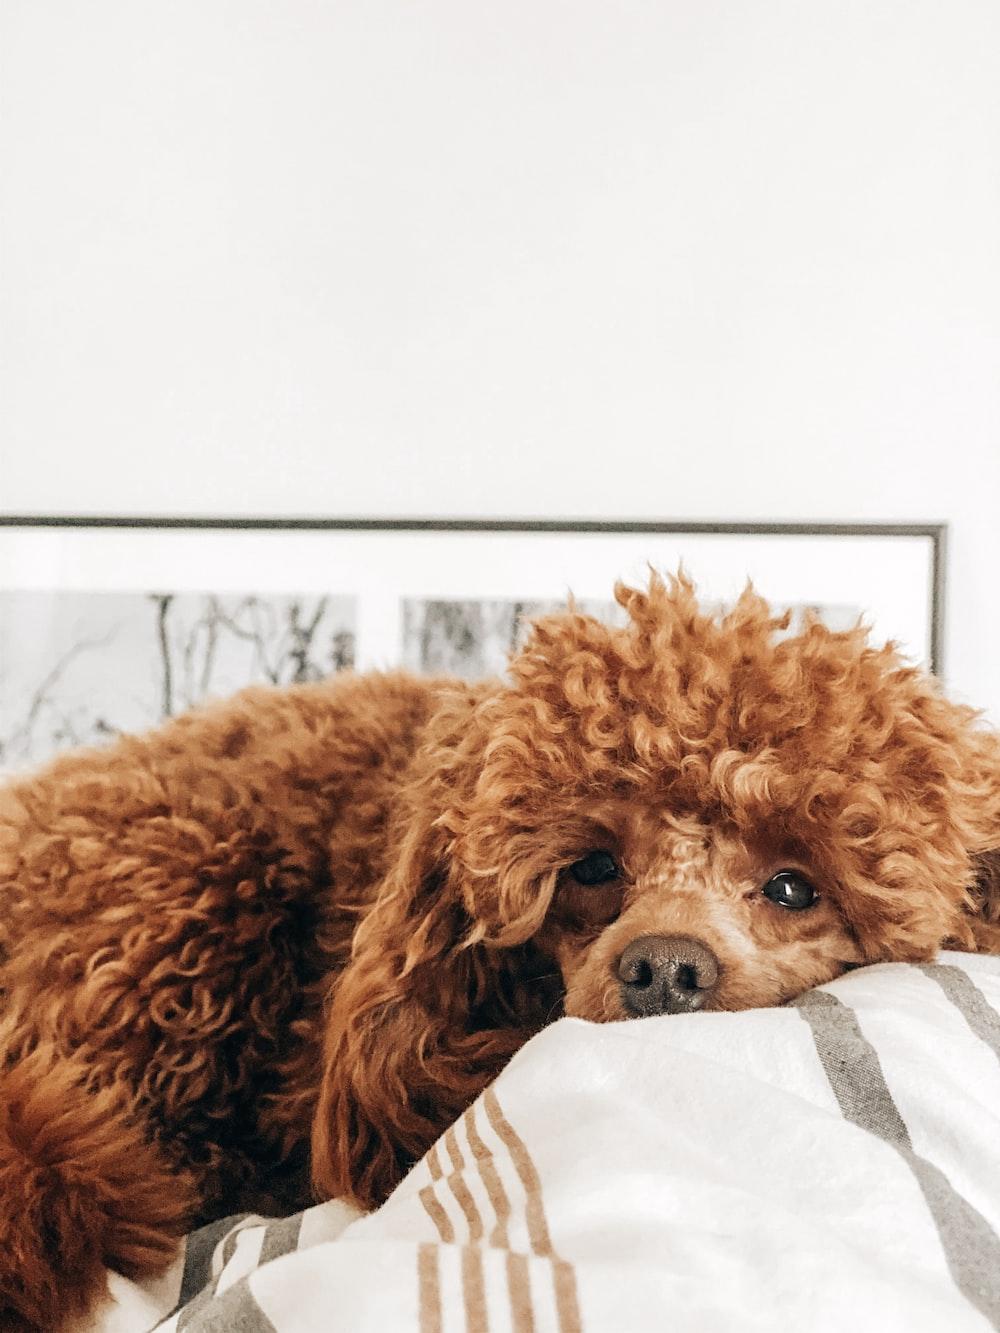 medium-coated brown dog